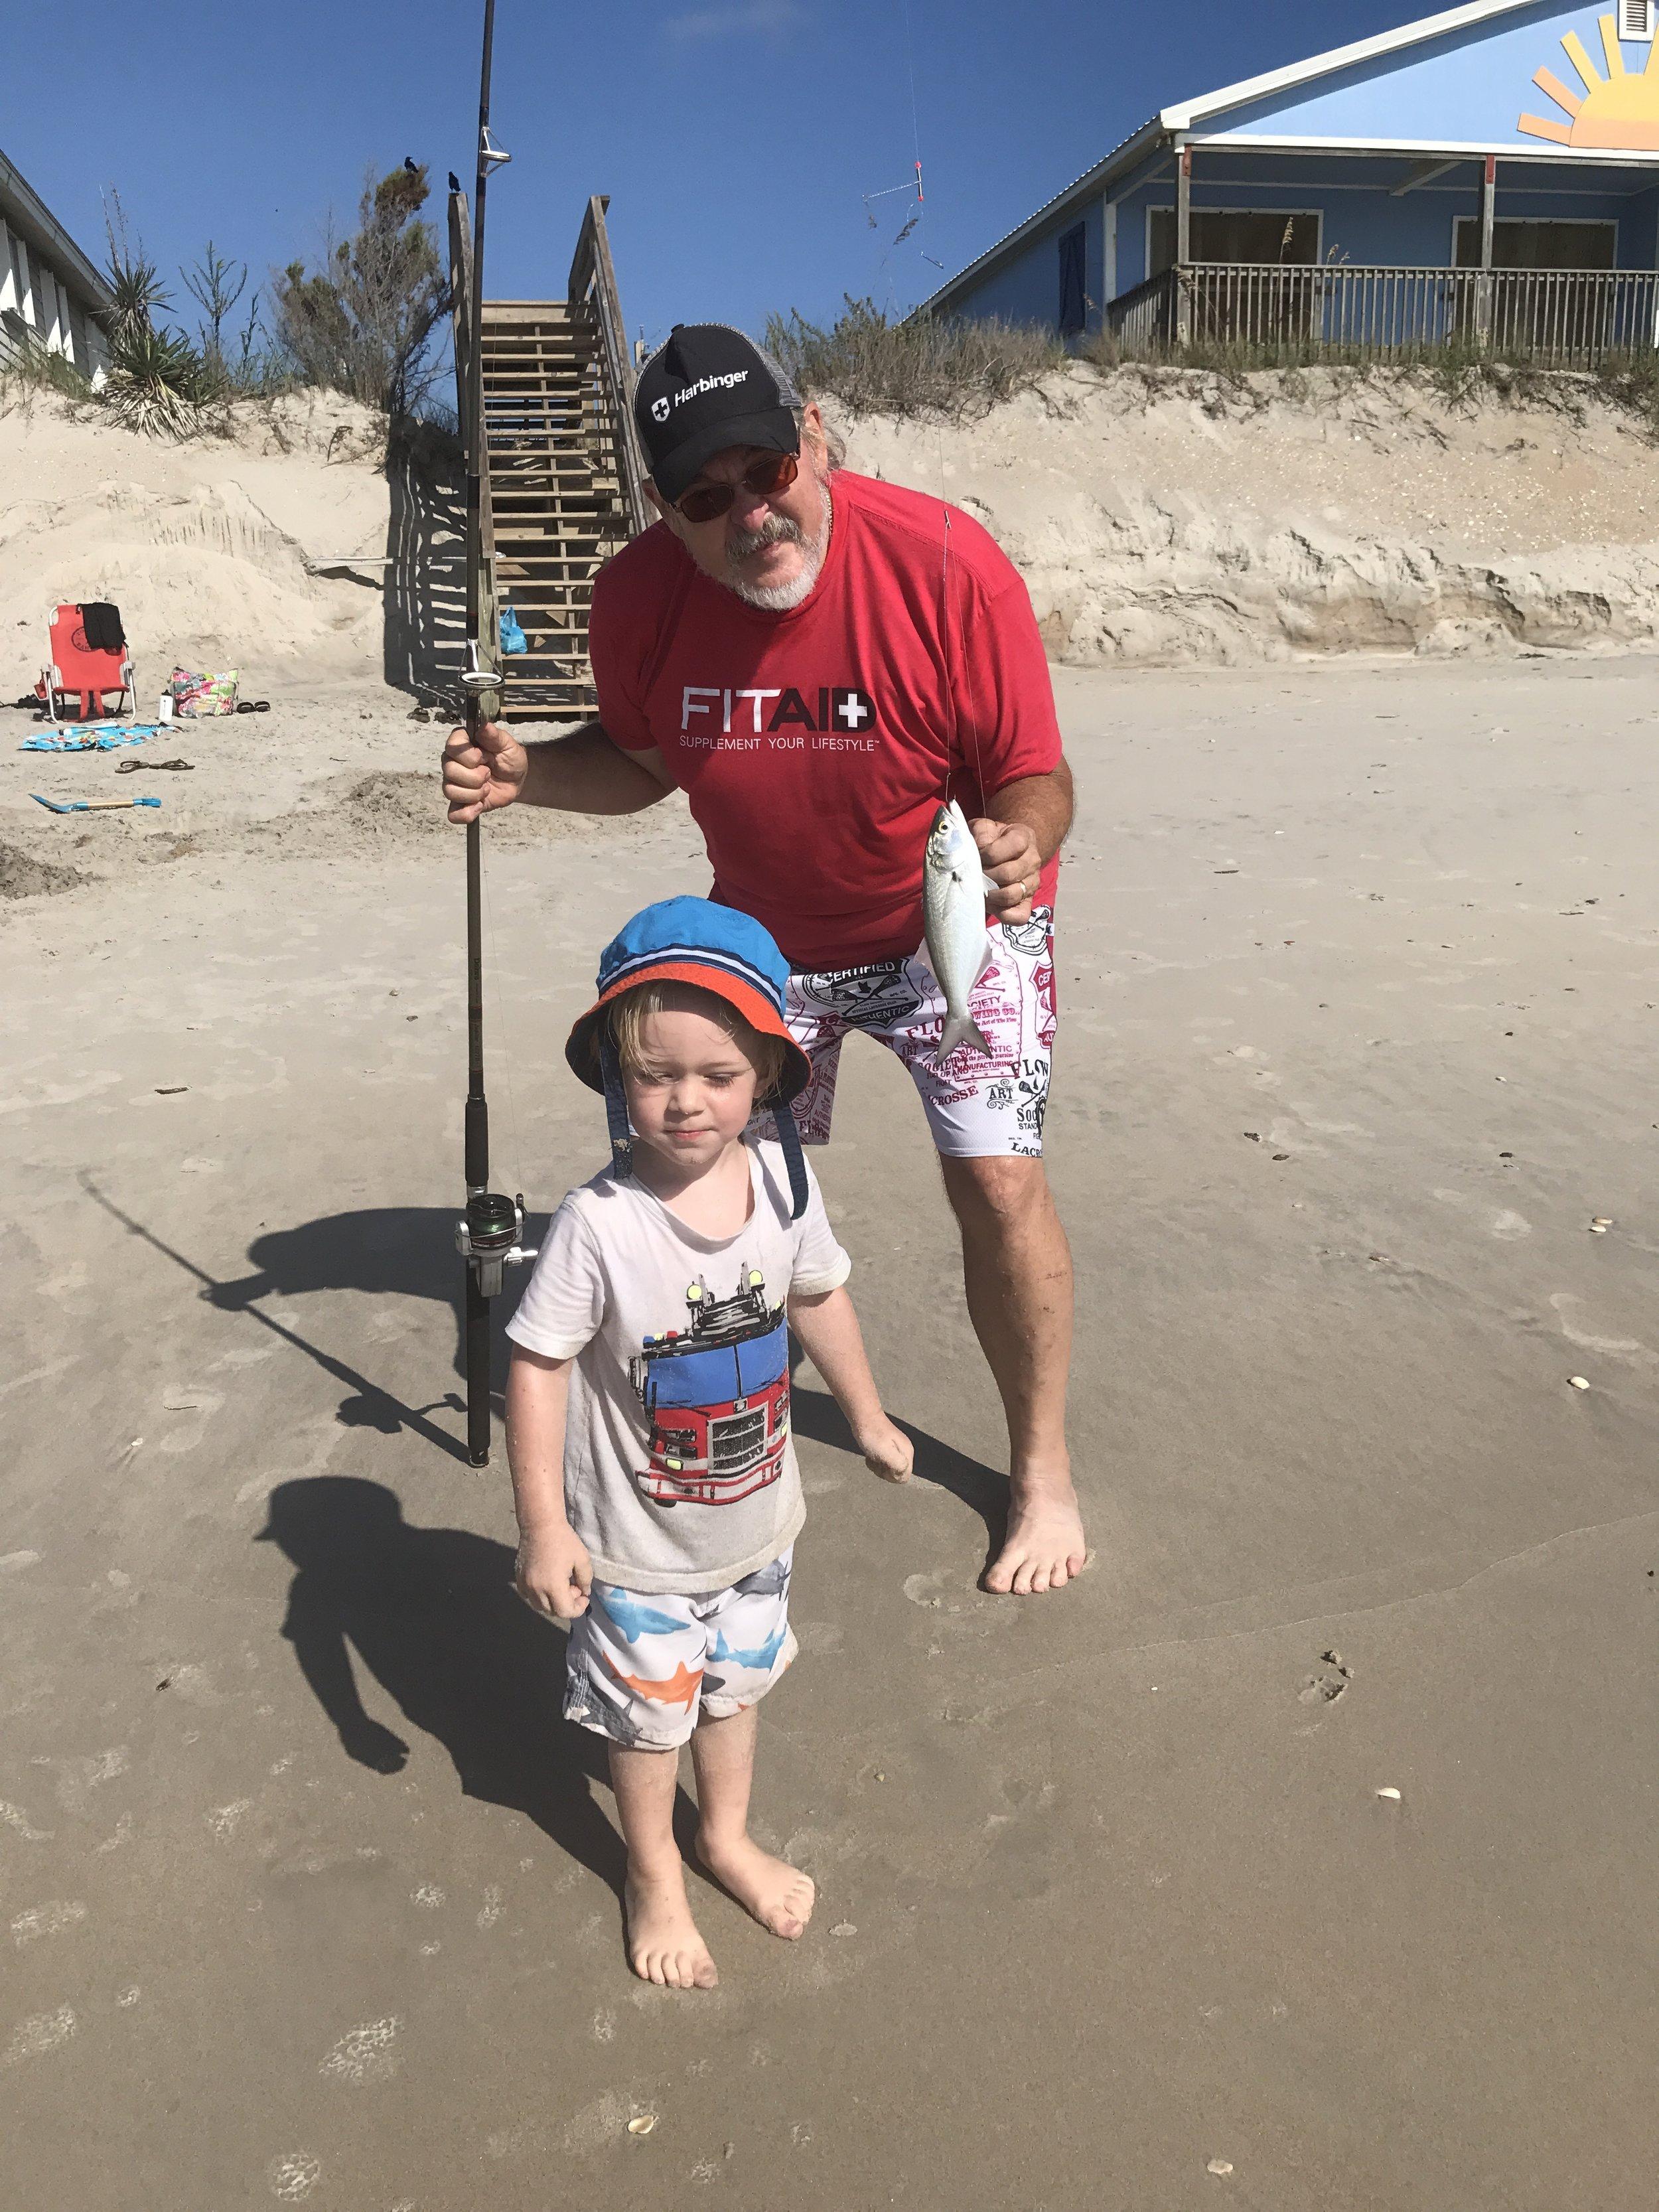 poppy and rock at beach.JPG